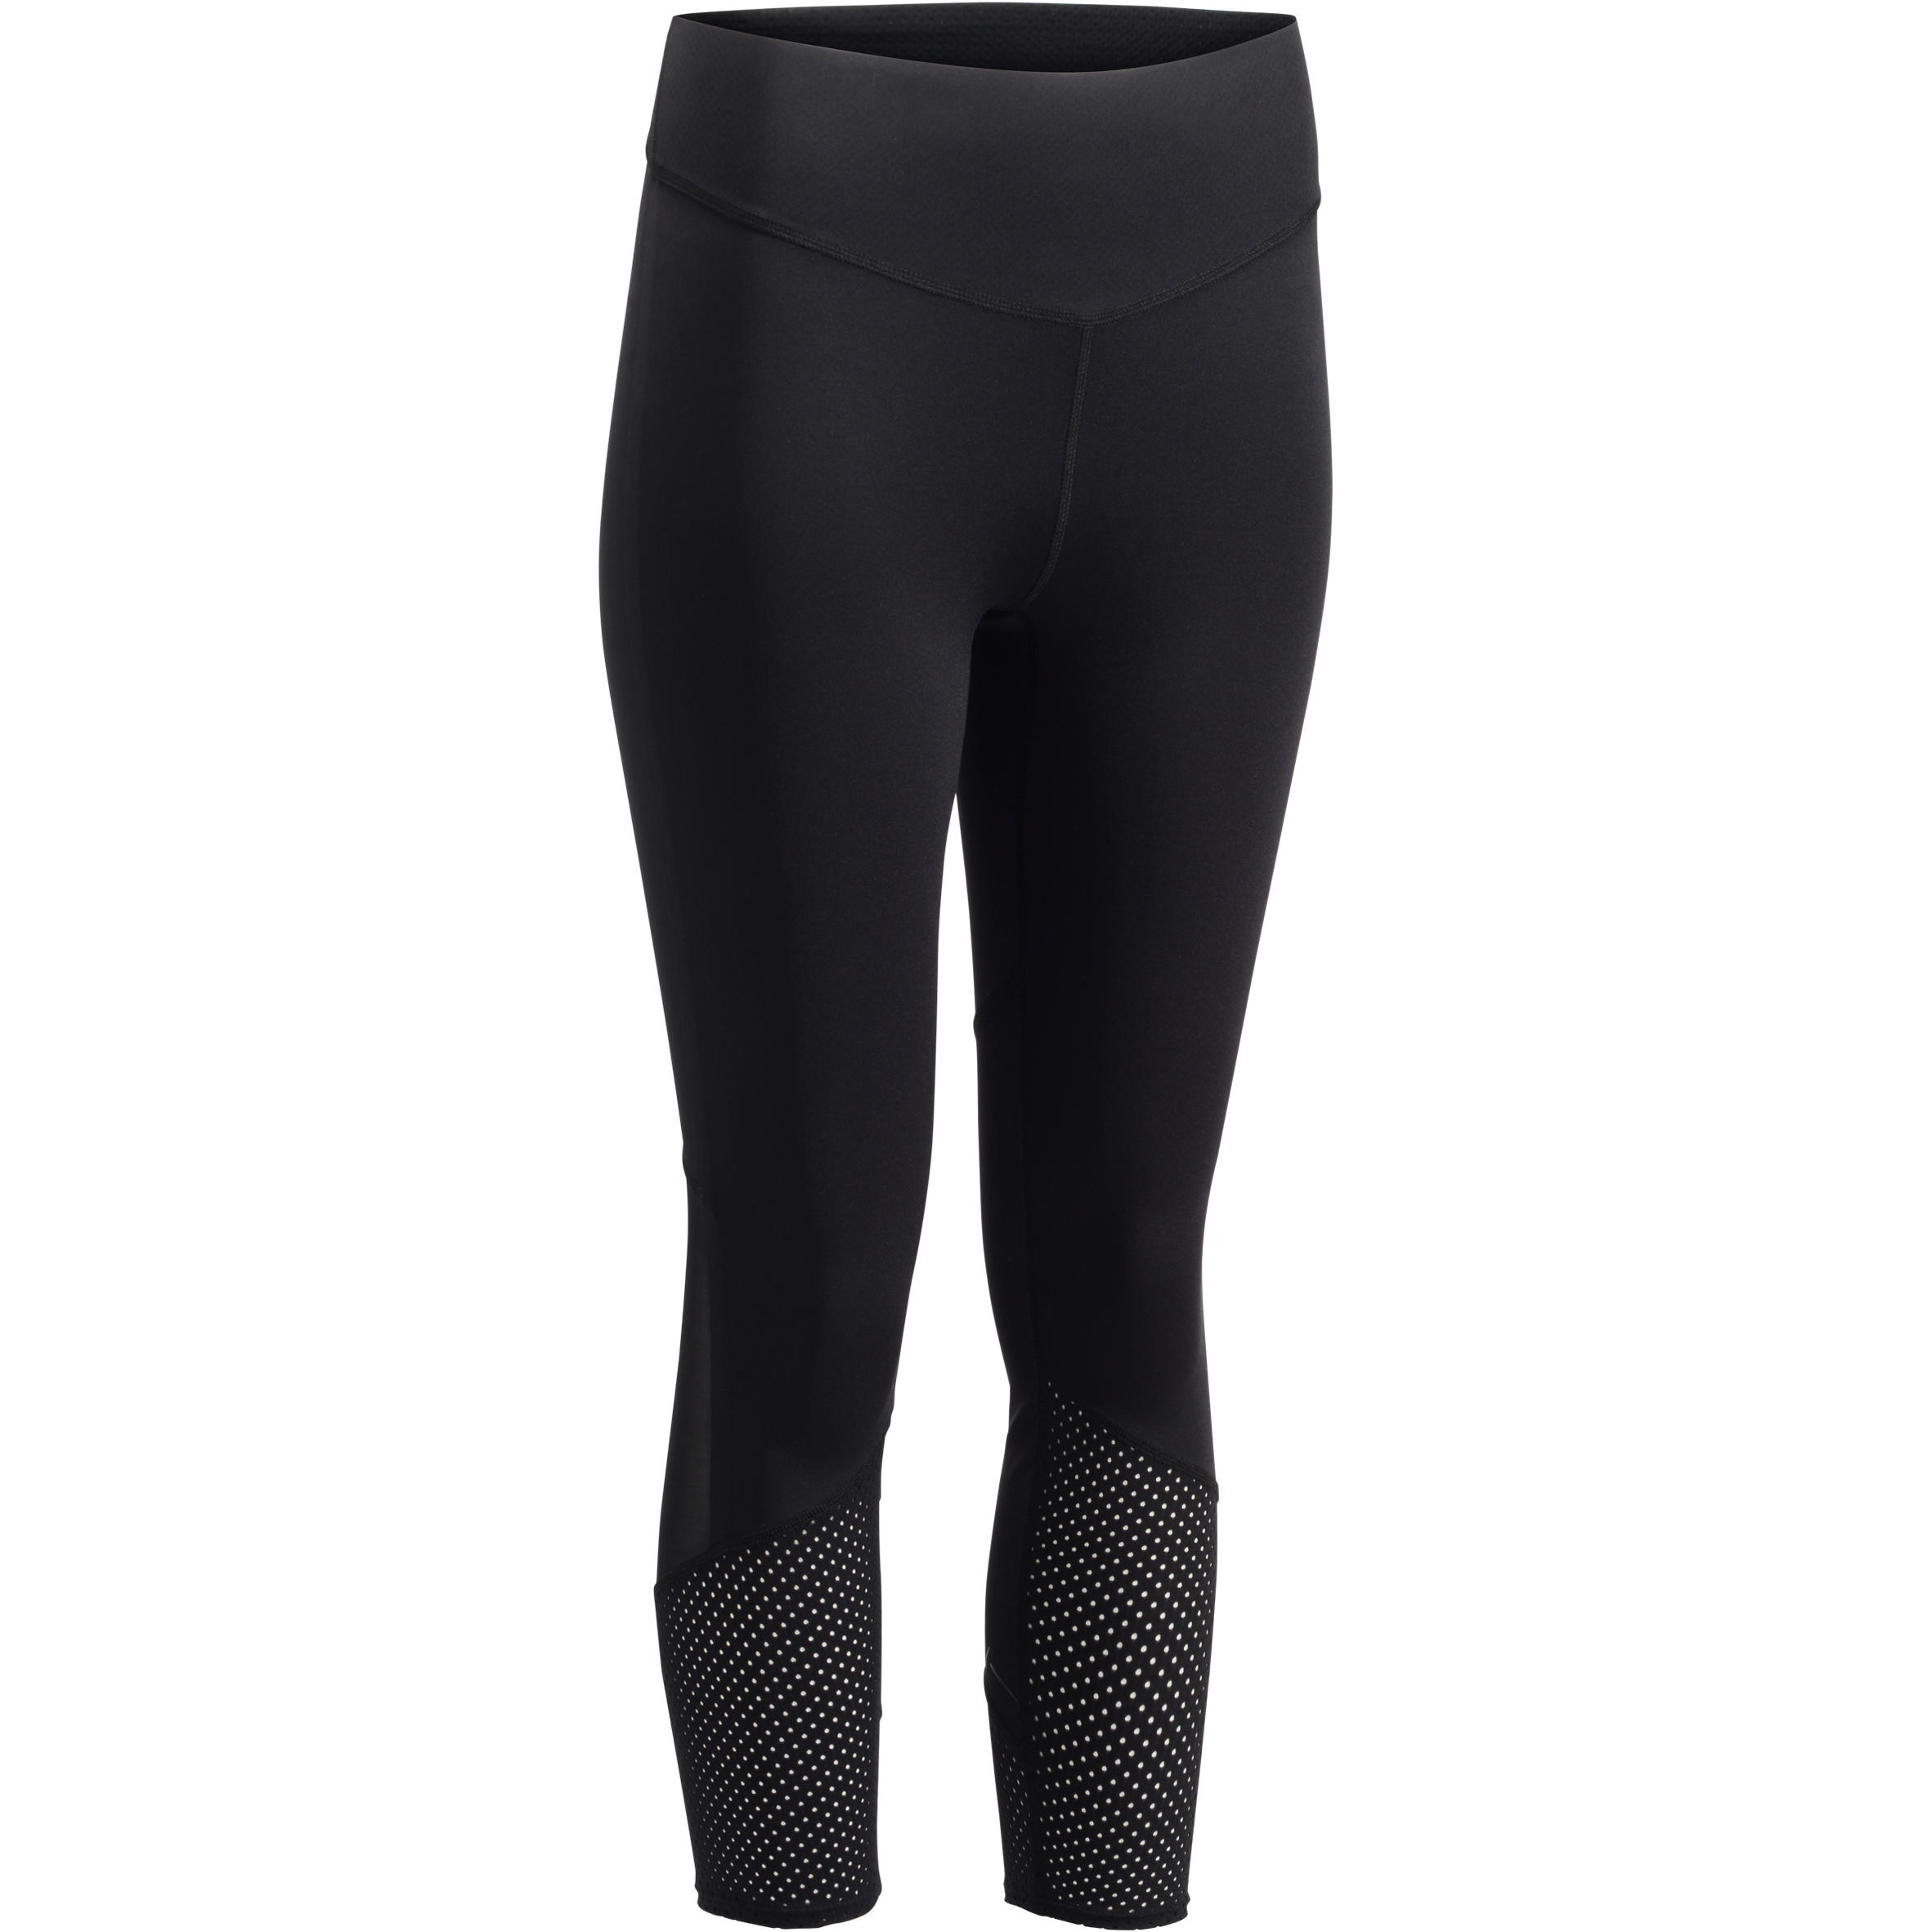 Legging 7/8 entraînement cardio femme noir 900